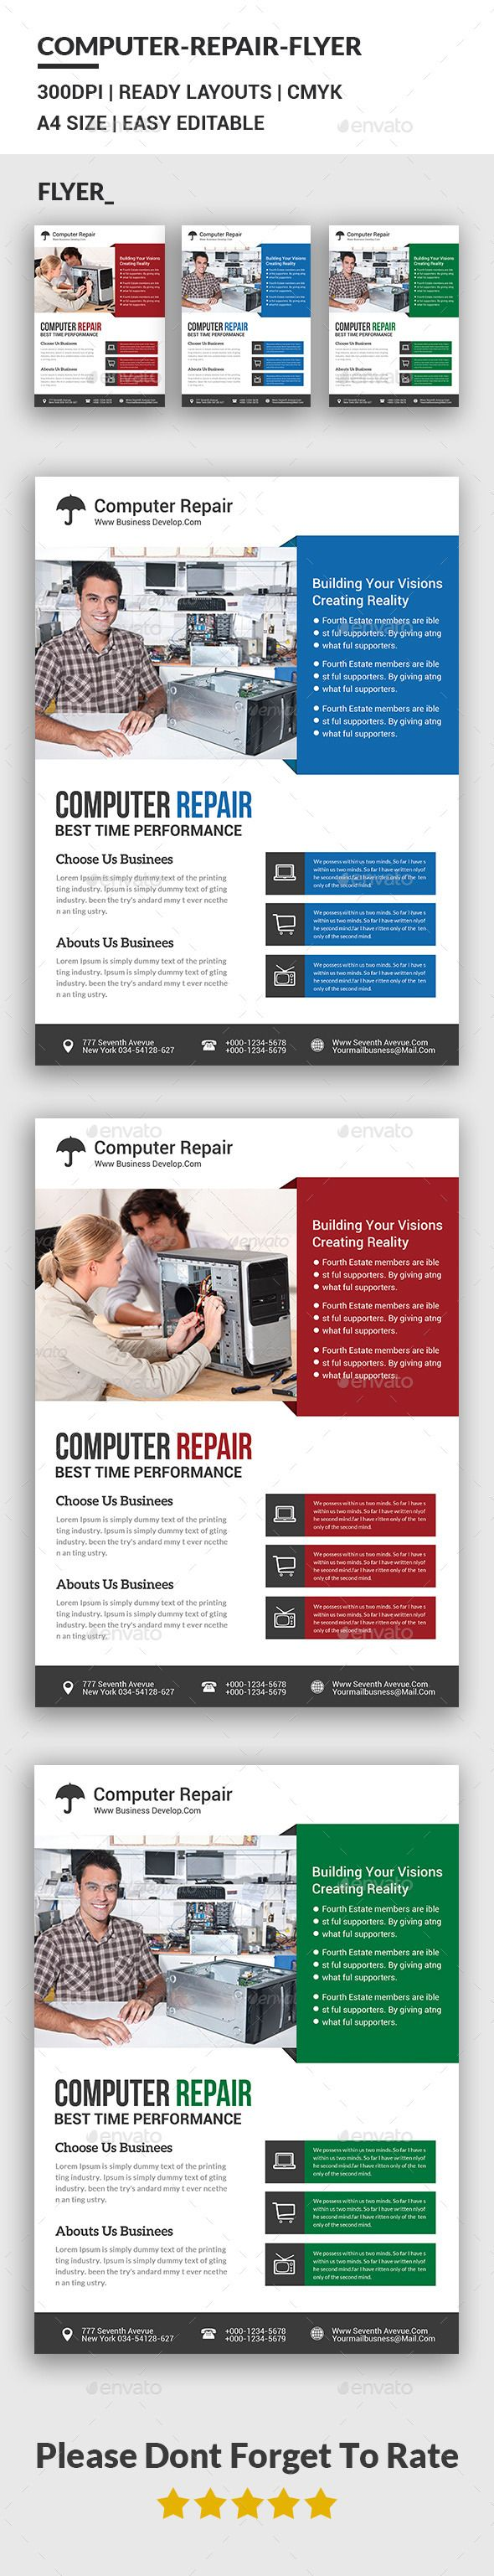 Computer Repair Flyer Template – Computer Repair Flyer Template